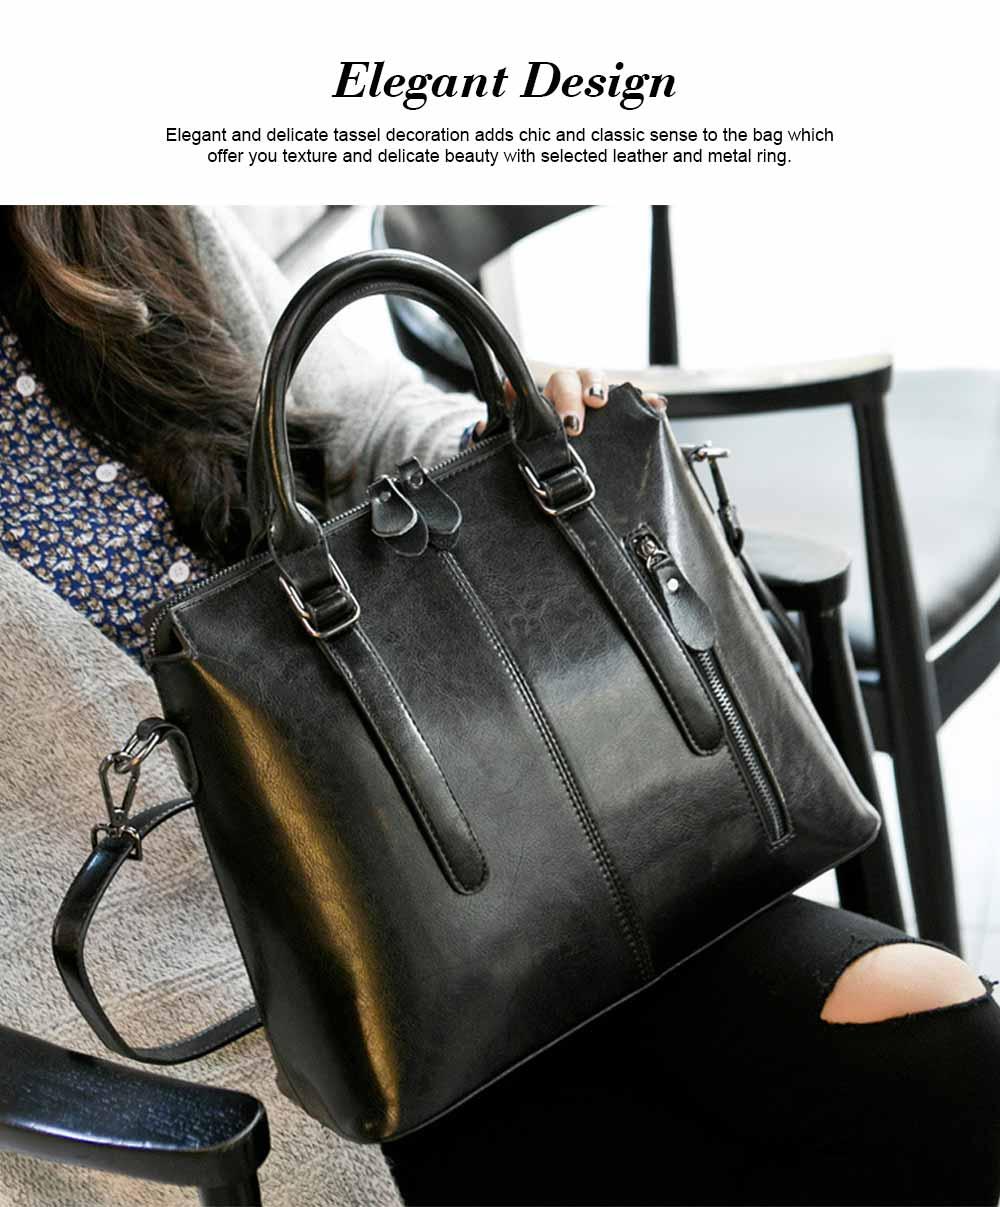 Oil Wax Leather Handbags With Adjustable Shoulder Strap, Fashion Ladies Portable Slung Shoulder Bag 1